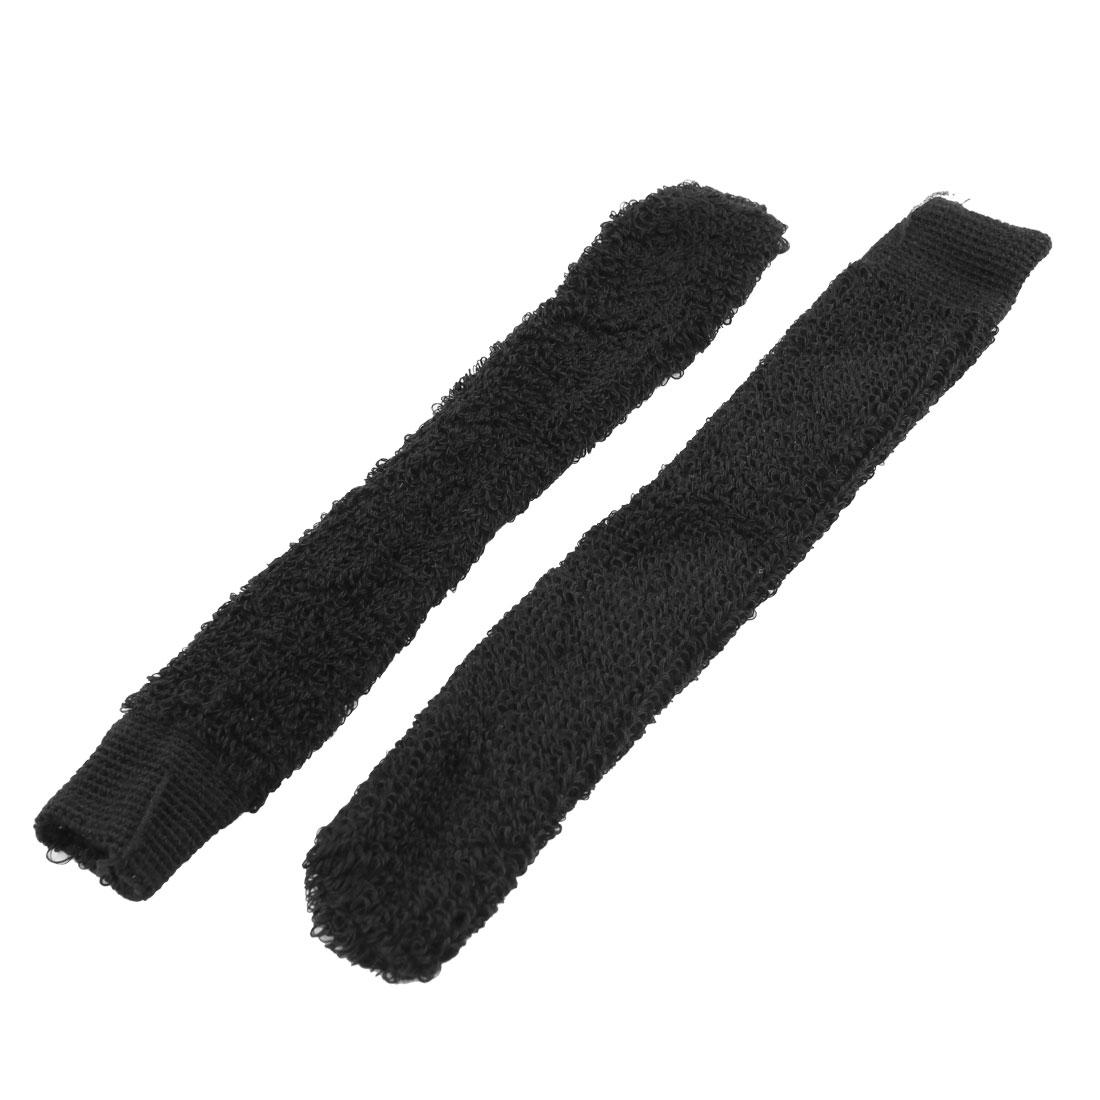 2PCS Black Elastic Terry Anti-slip Badminton Racket Hand Wrap Towel Grip Cover